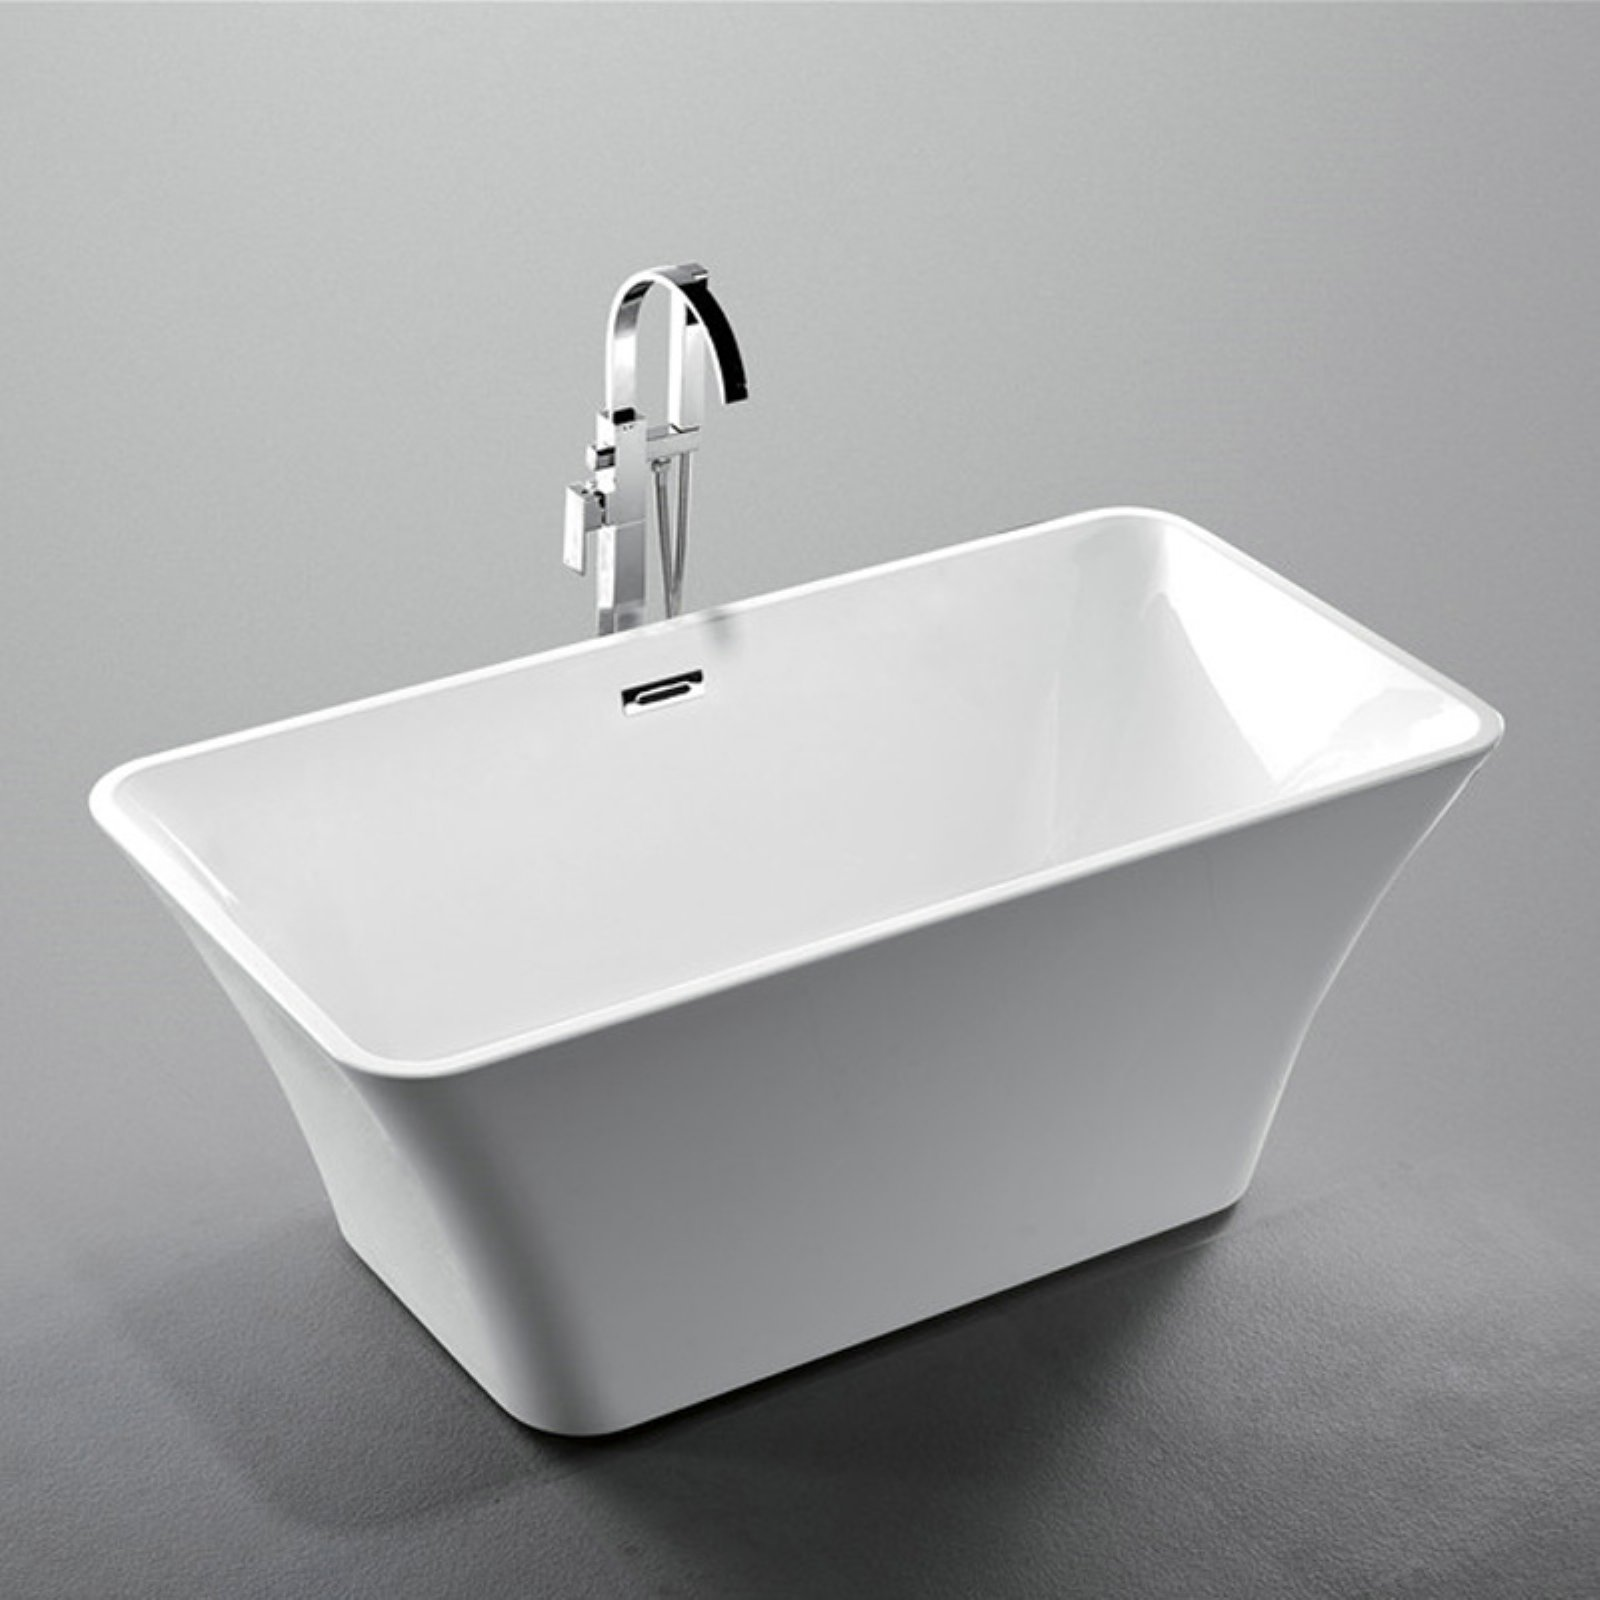 Legion Furniture WE6840 Acrylic 67 in. Freestanding Soaking Bathtub